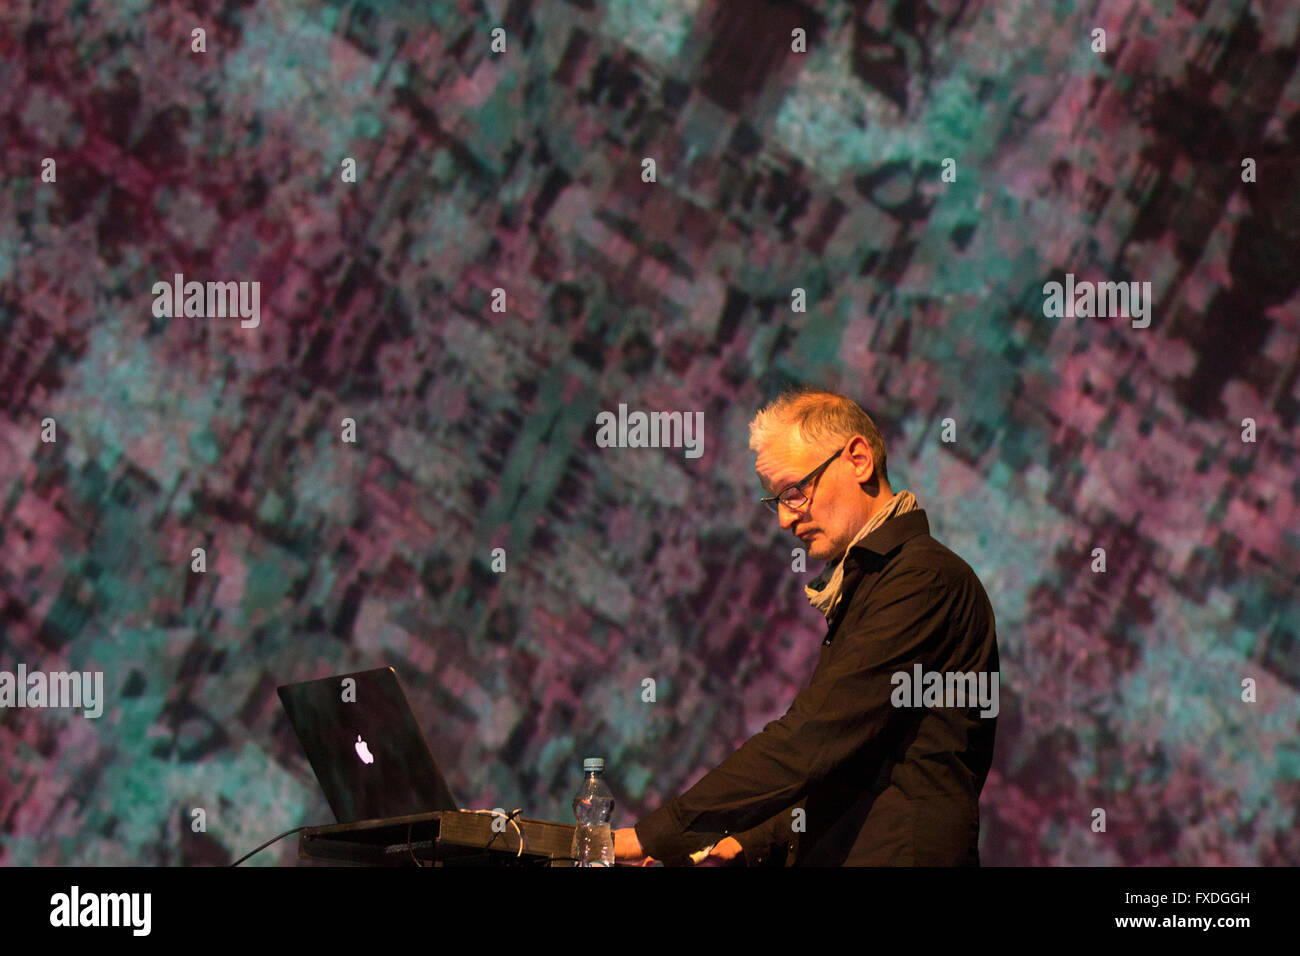 Arovane (German electronic music artist Uwe Zahn) in concert in Prague - Stock Image